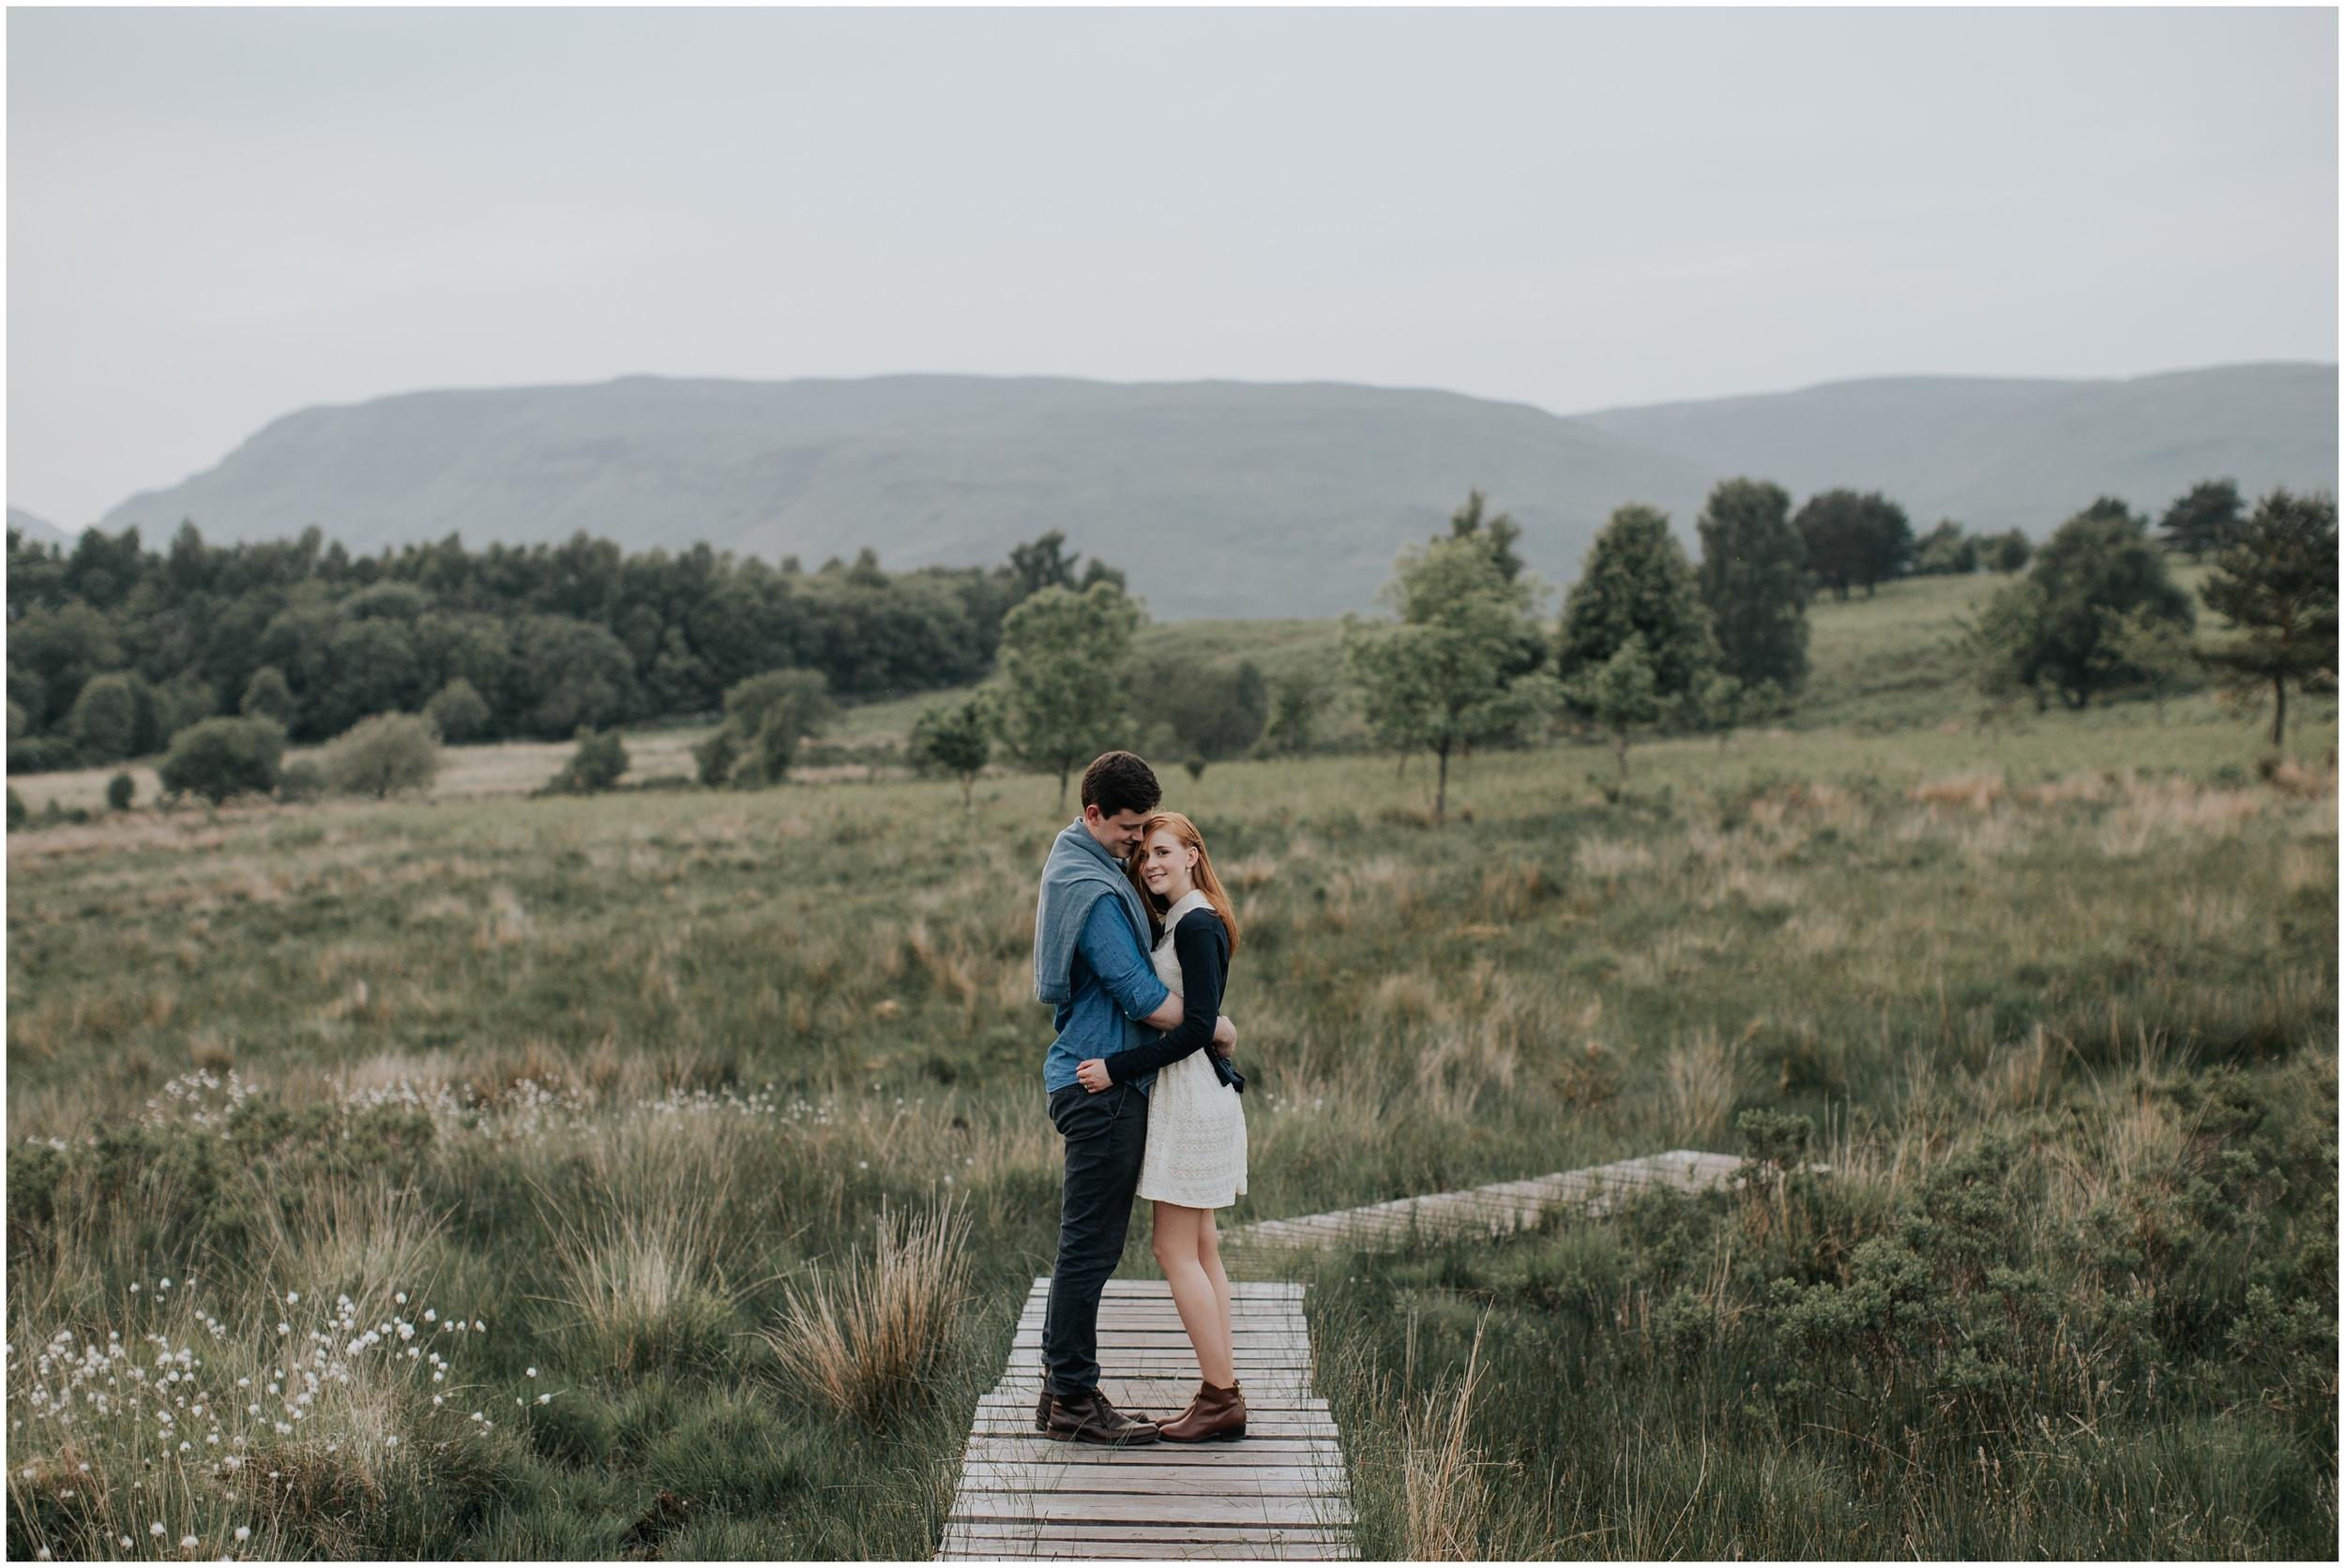 Morgan Lewis Photography 78 Glasgow Wedding Photographer Loch Ardinning_0021.jpg